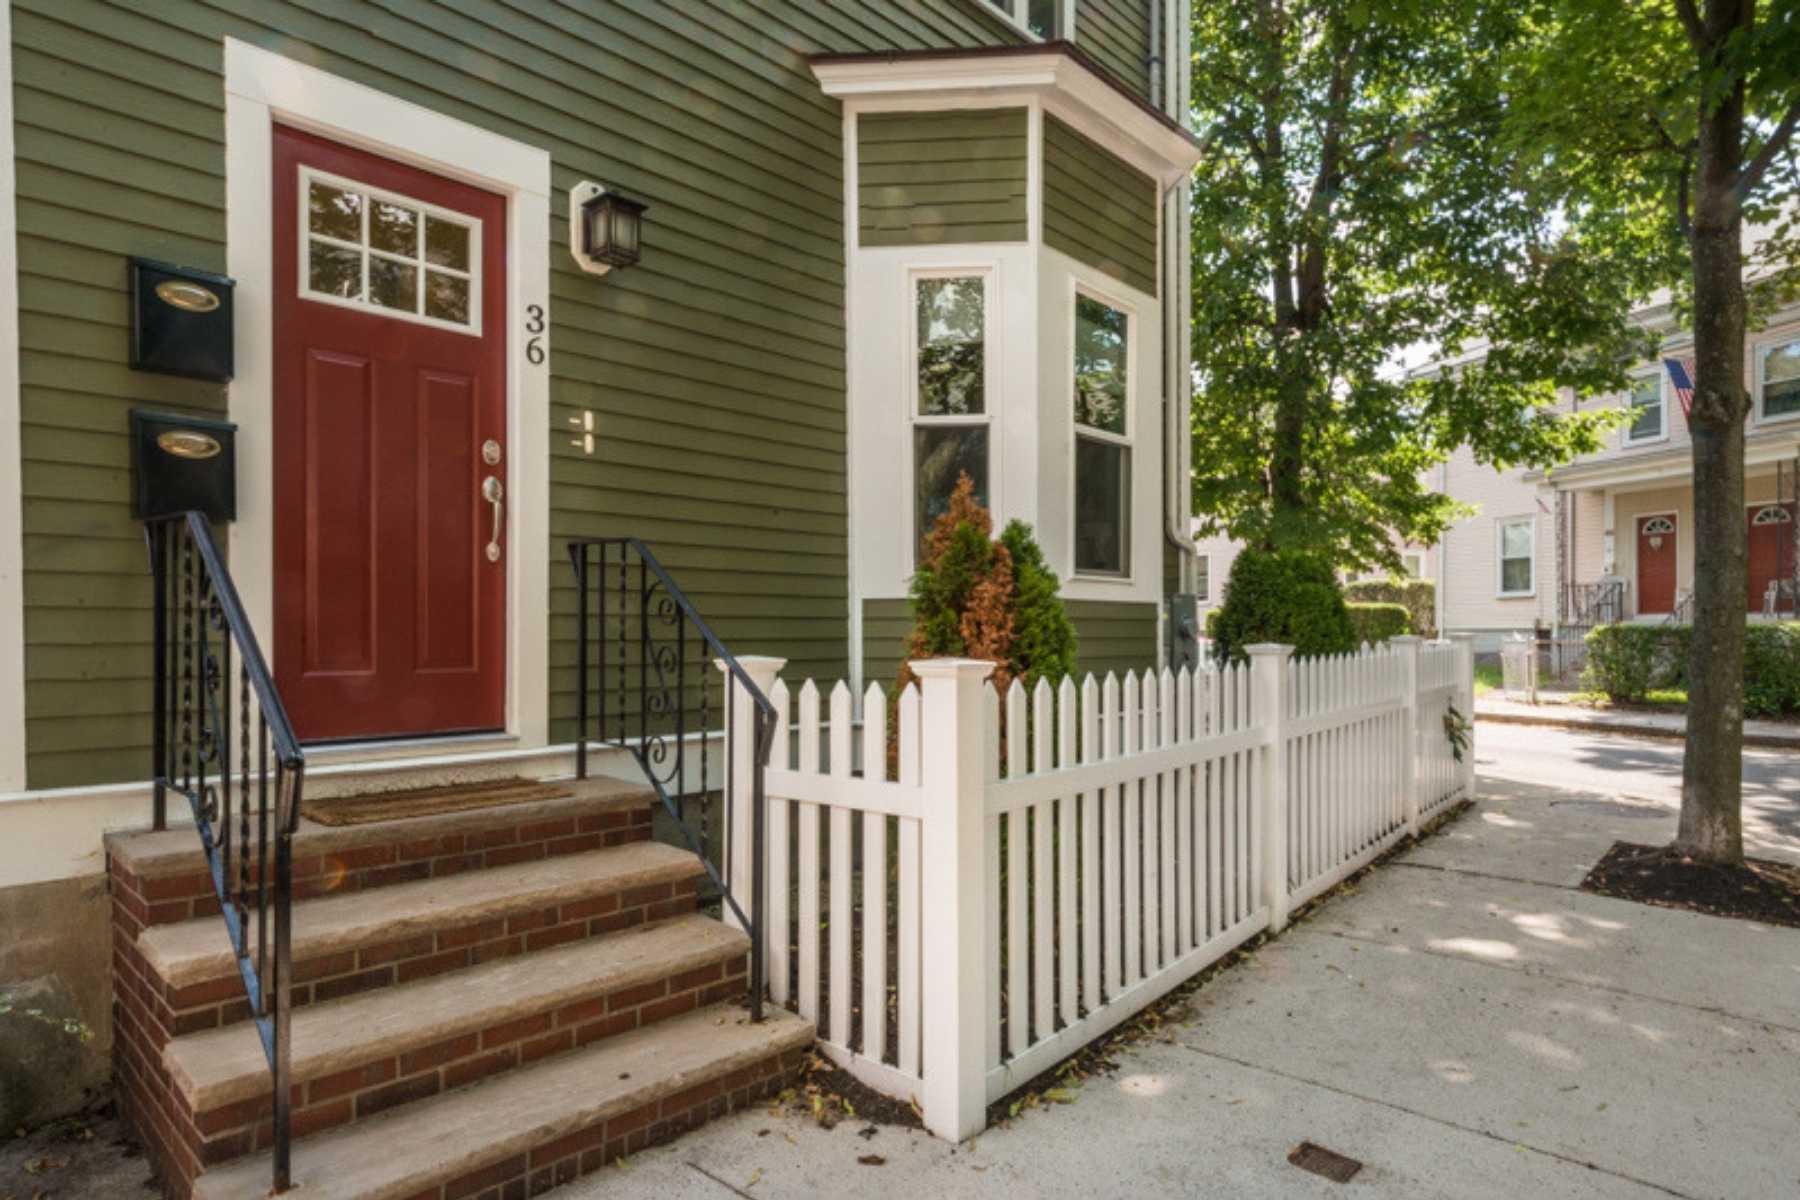 4-CapstoneCommunities-property-OakStreetCondominiums-Somerville.jpg